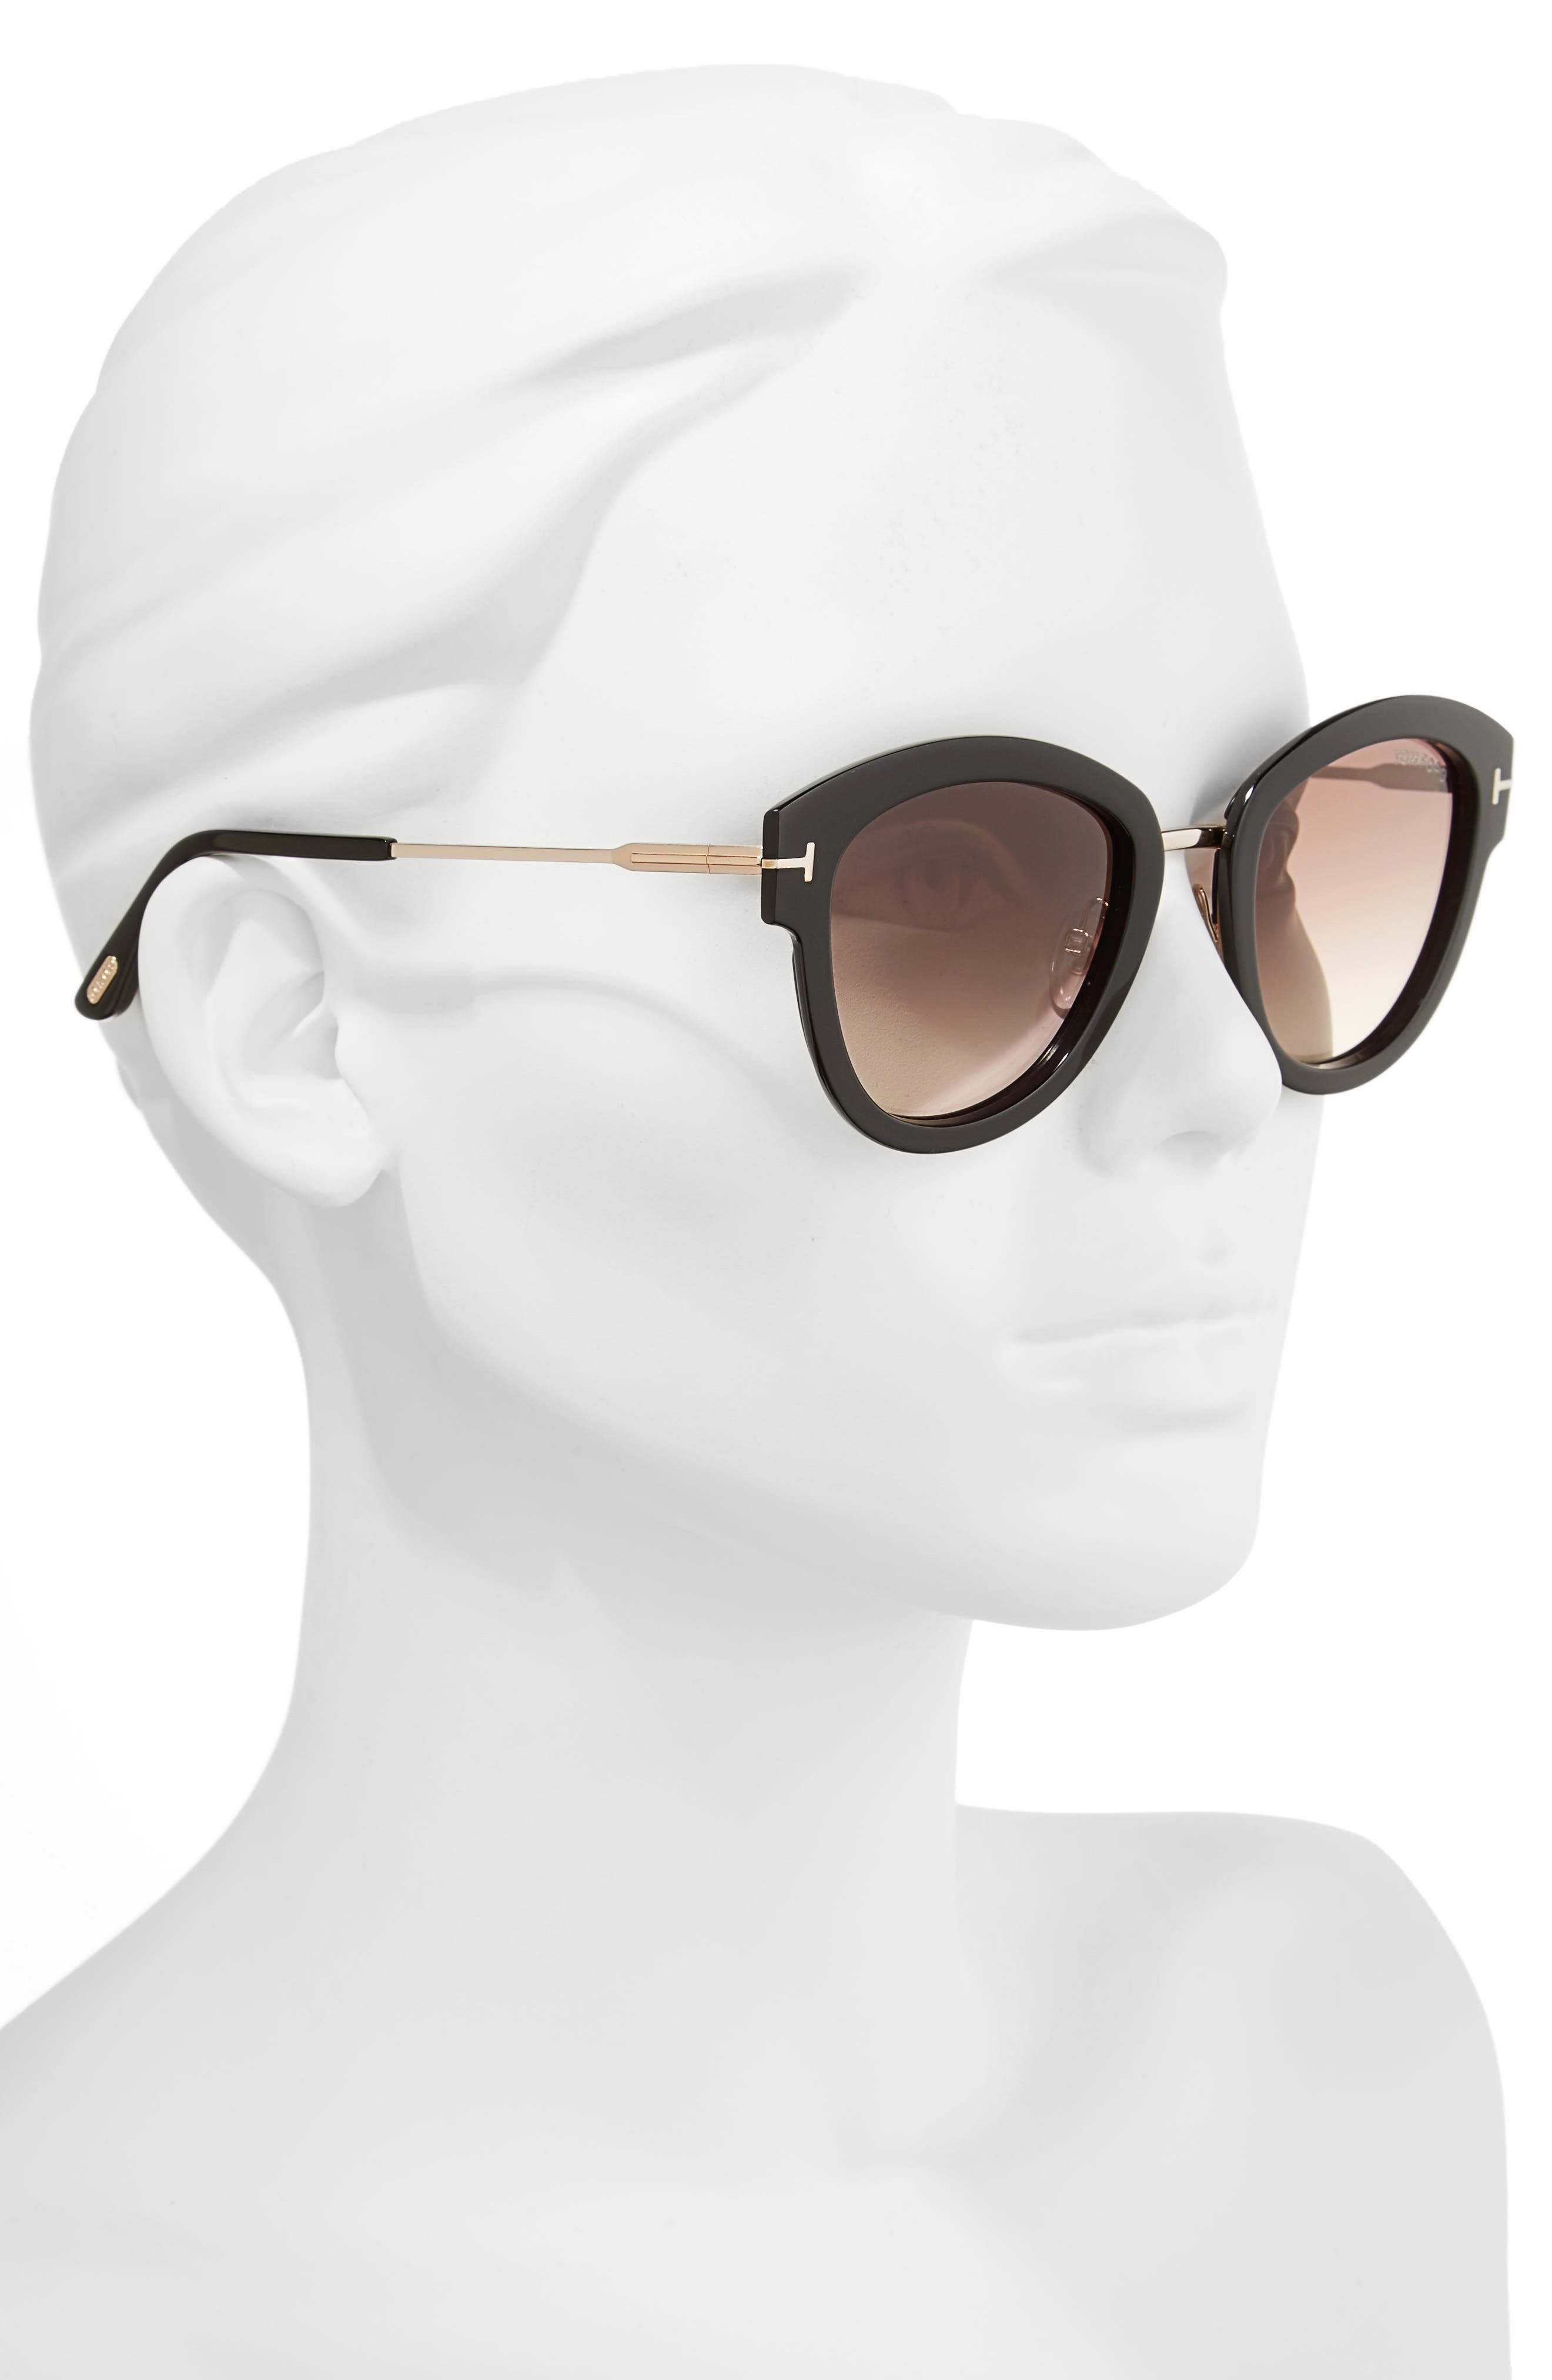 Mia 55mm Cat Eye Sunglasses,                             Alternate thumbnail 2, color,                             BLACK ACETATE/ ROSE GOLD